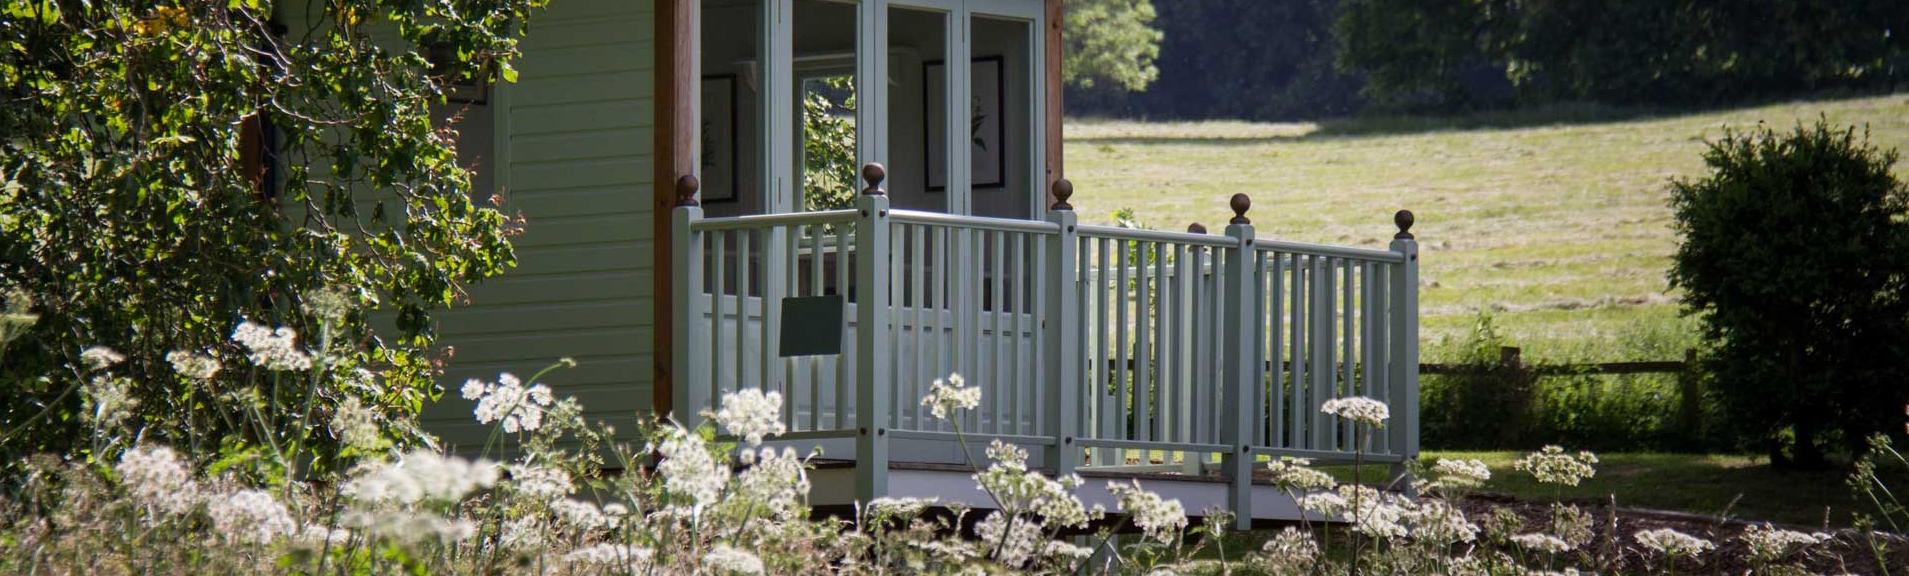 Gardens and Wildlife -